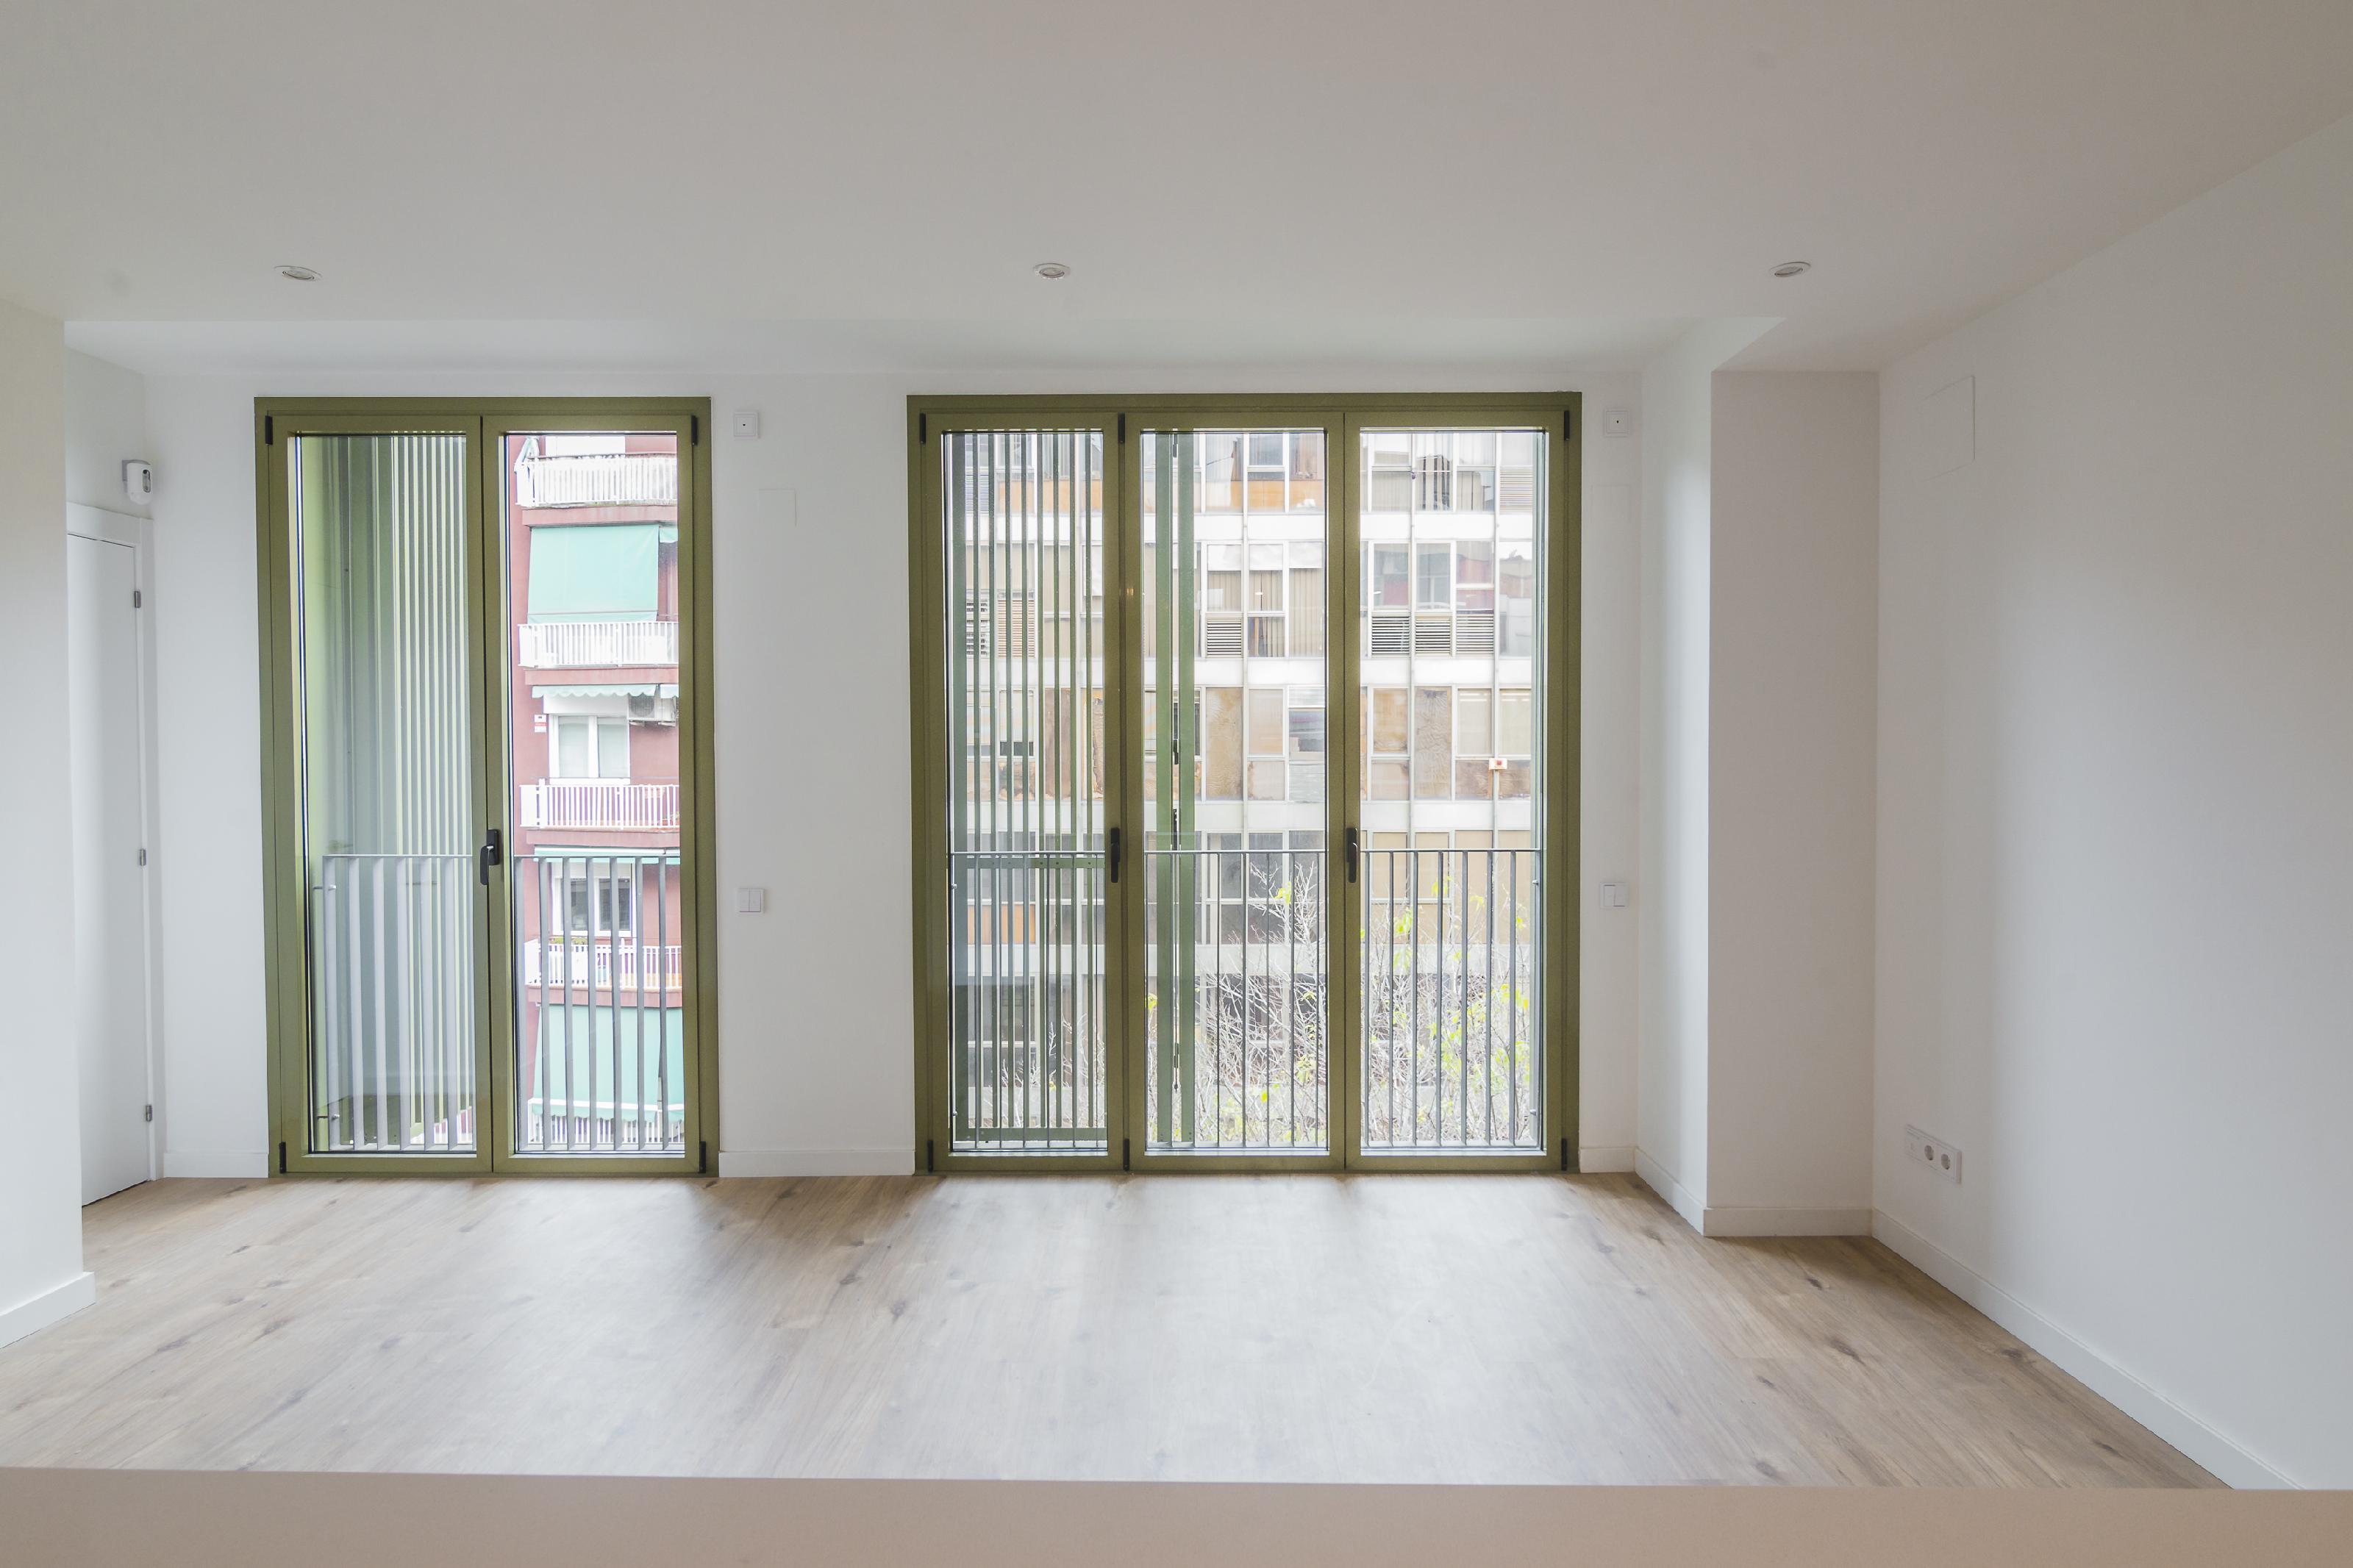 249857 Flat for sale in Eixample, Nova Esquerra Eixample 10